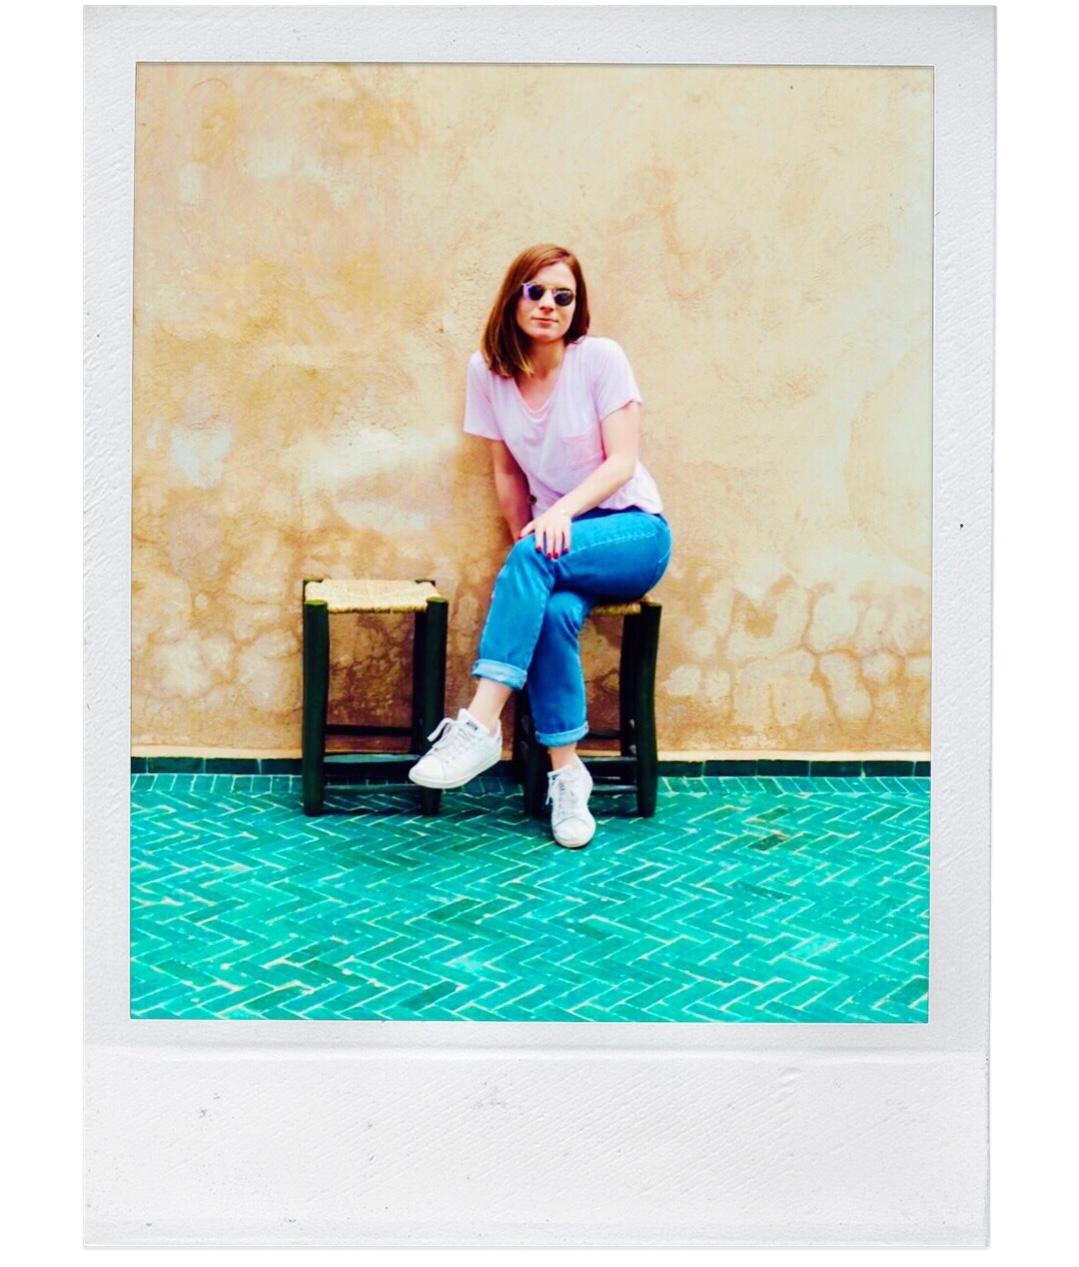 About Lola marrakech